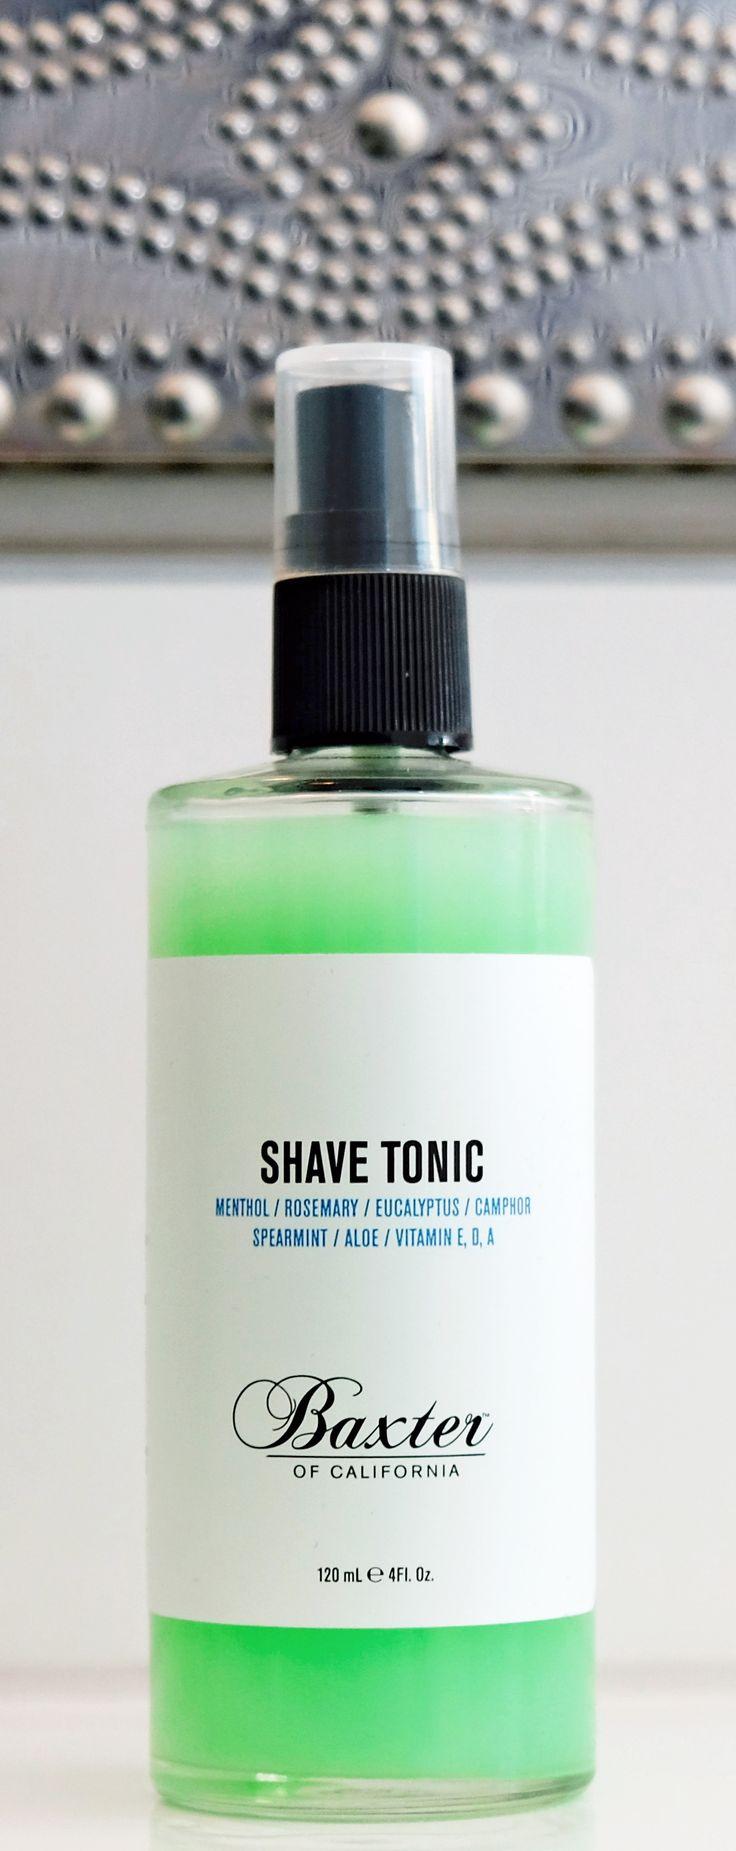 After Shave Tonic from Baxter of California • Männerkosmetik! Geniales Produkt • Love it!